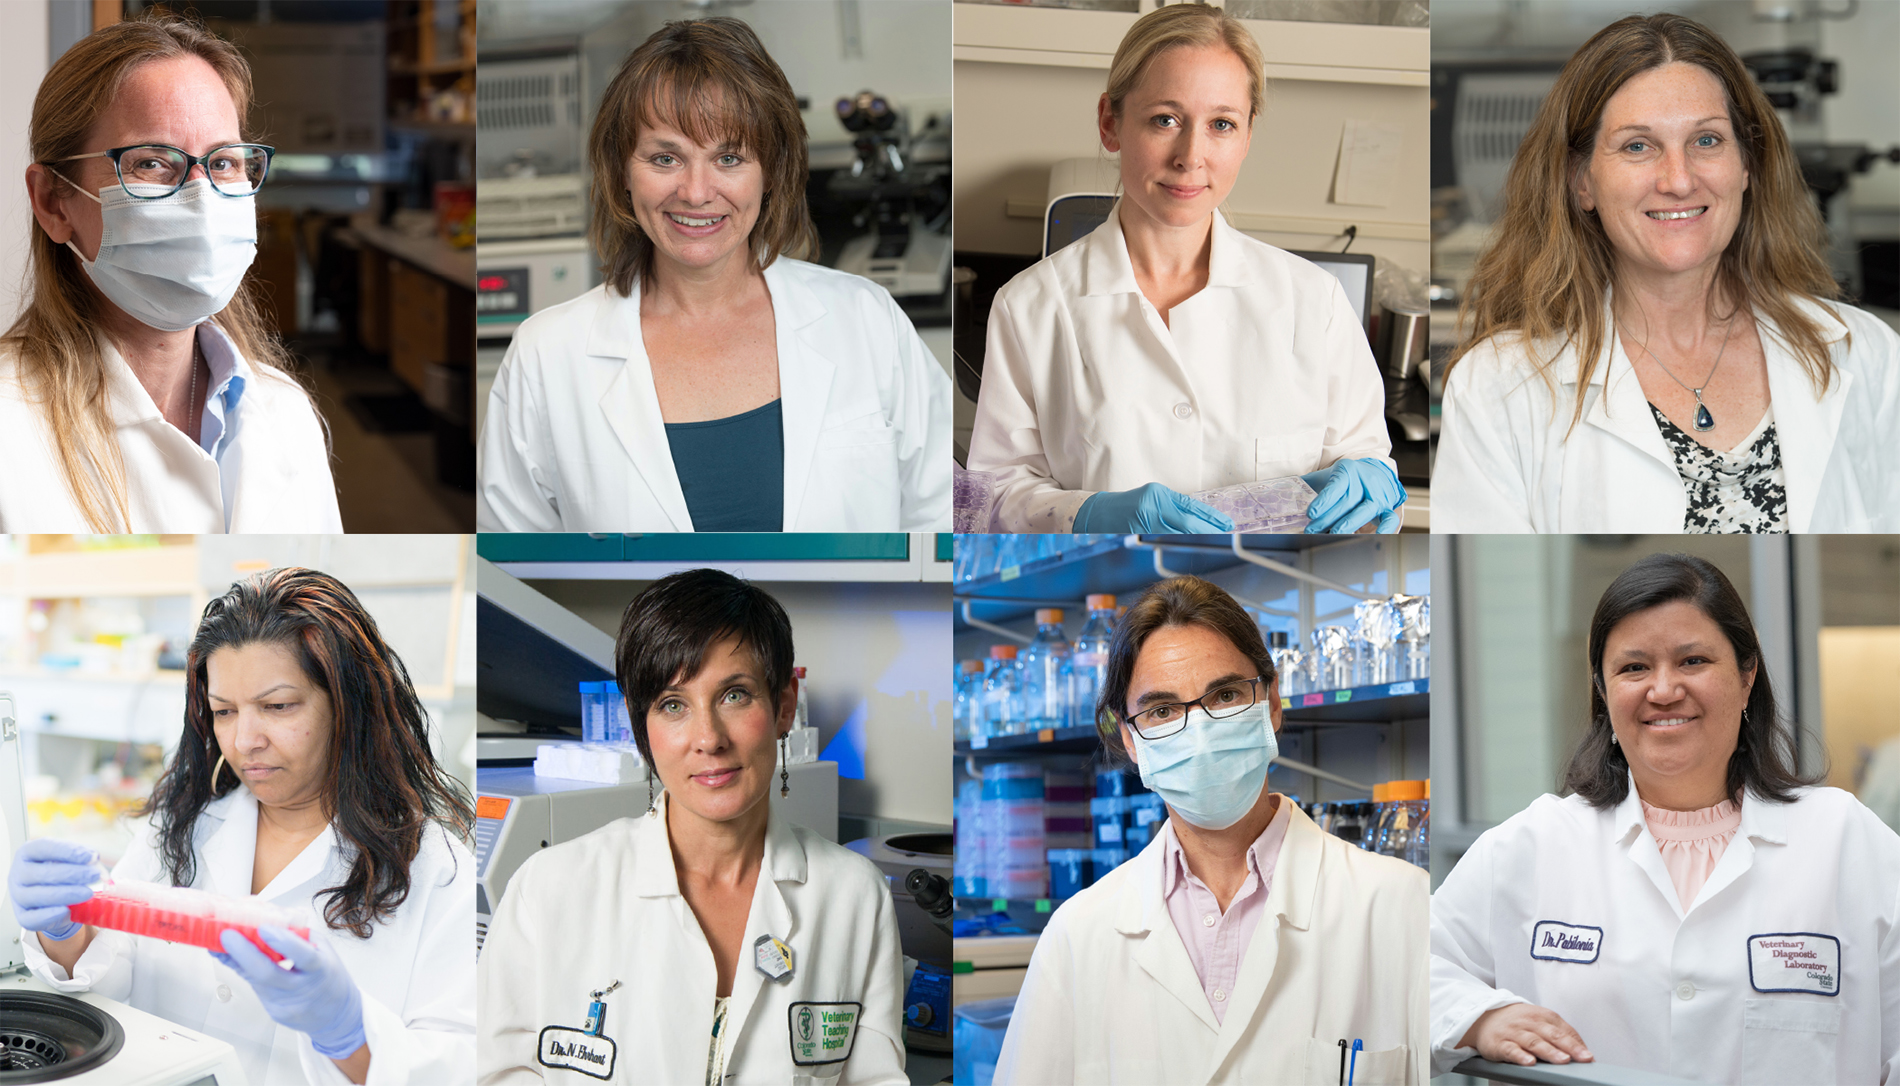 CSU researchers pursuing solutions to COVID-19 include, top row, Amy MacNeill, Candace Mathiason, Rebekah Kading, and Sue VandeWoude; bottom row, Rushika Perera, Nicole Ehrhart, Mary Jackson, and Kristy Pabilonia, among many others. Photos: Colorado State University